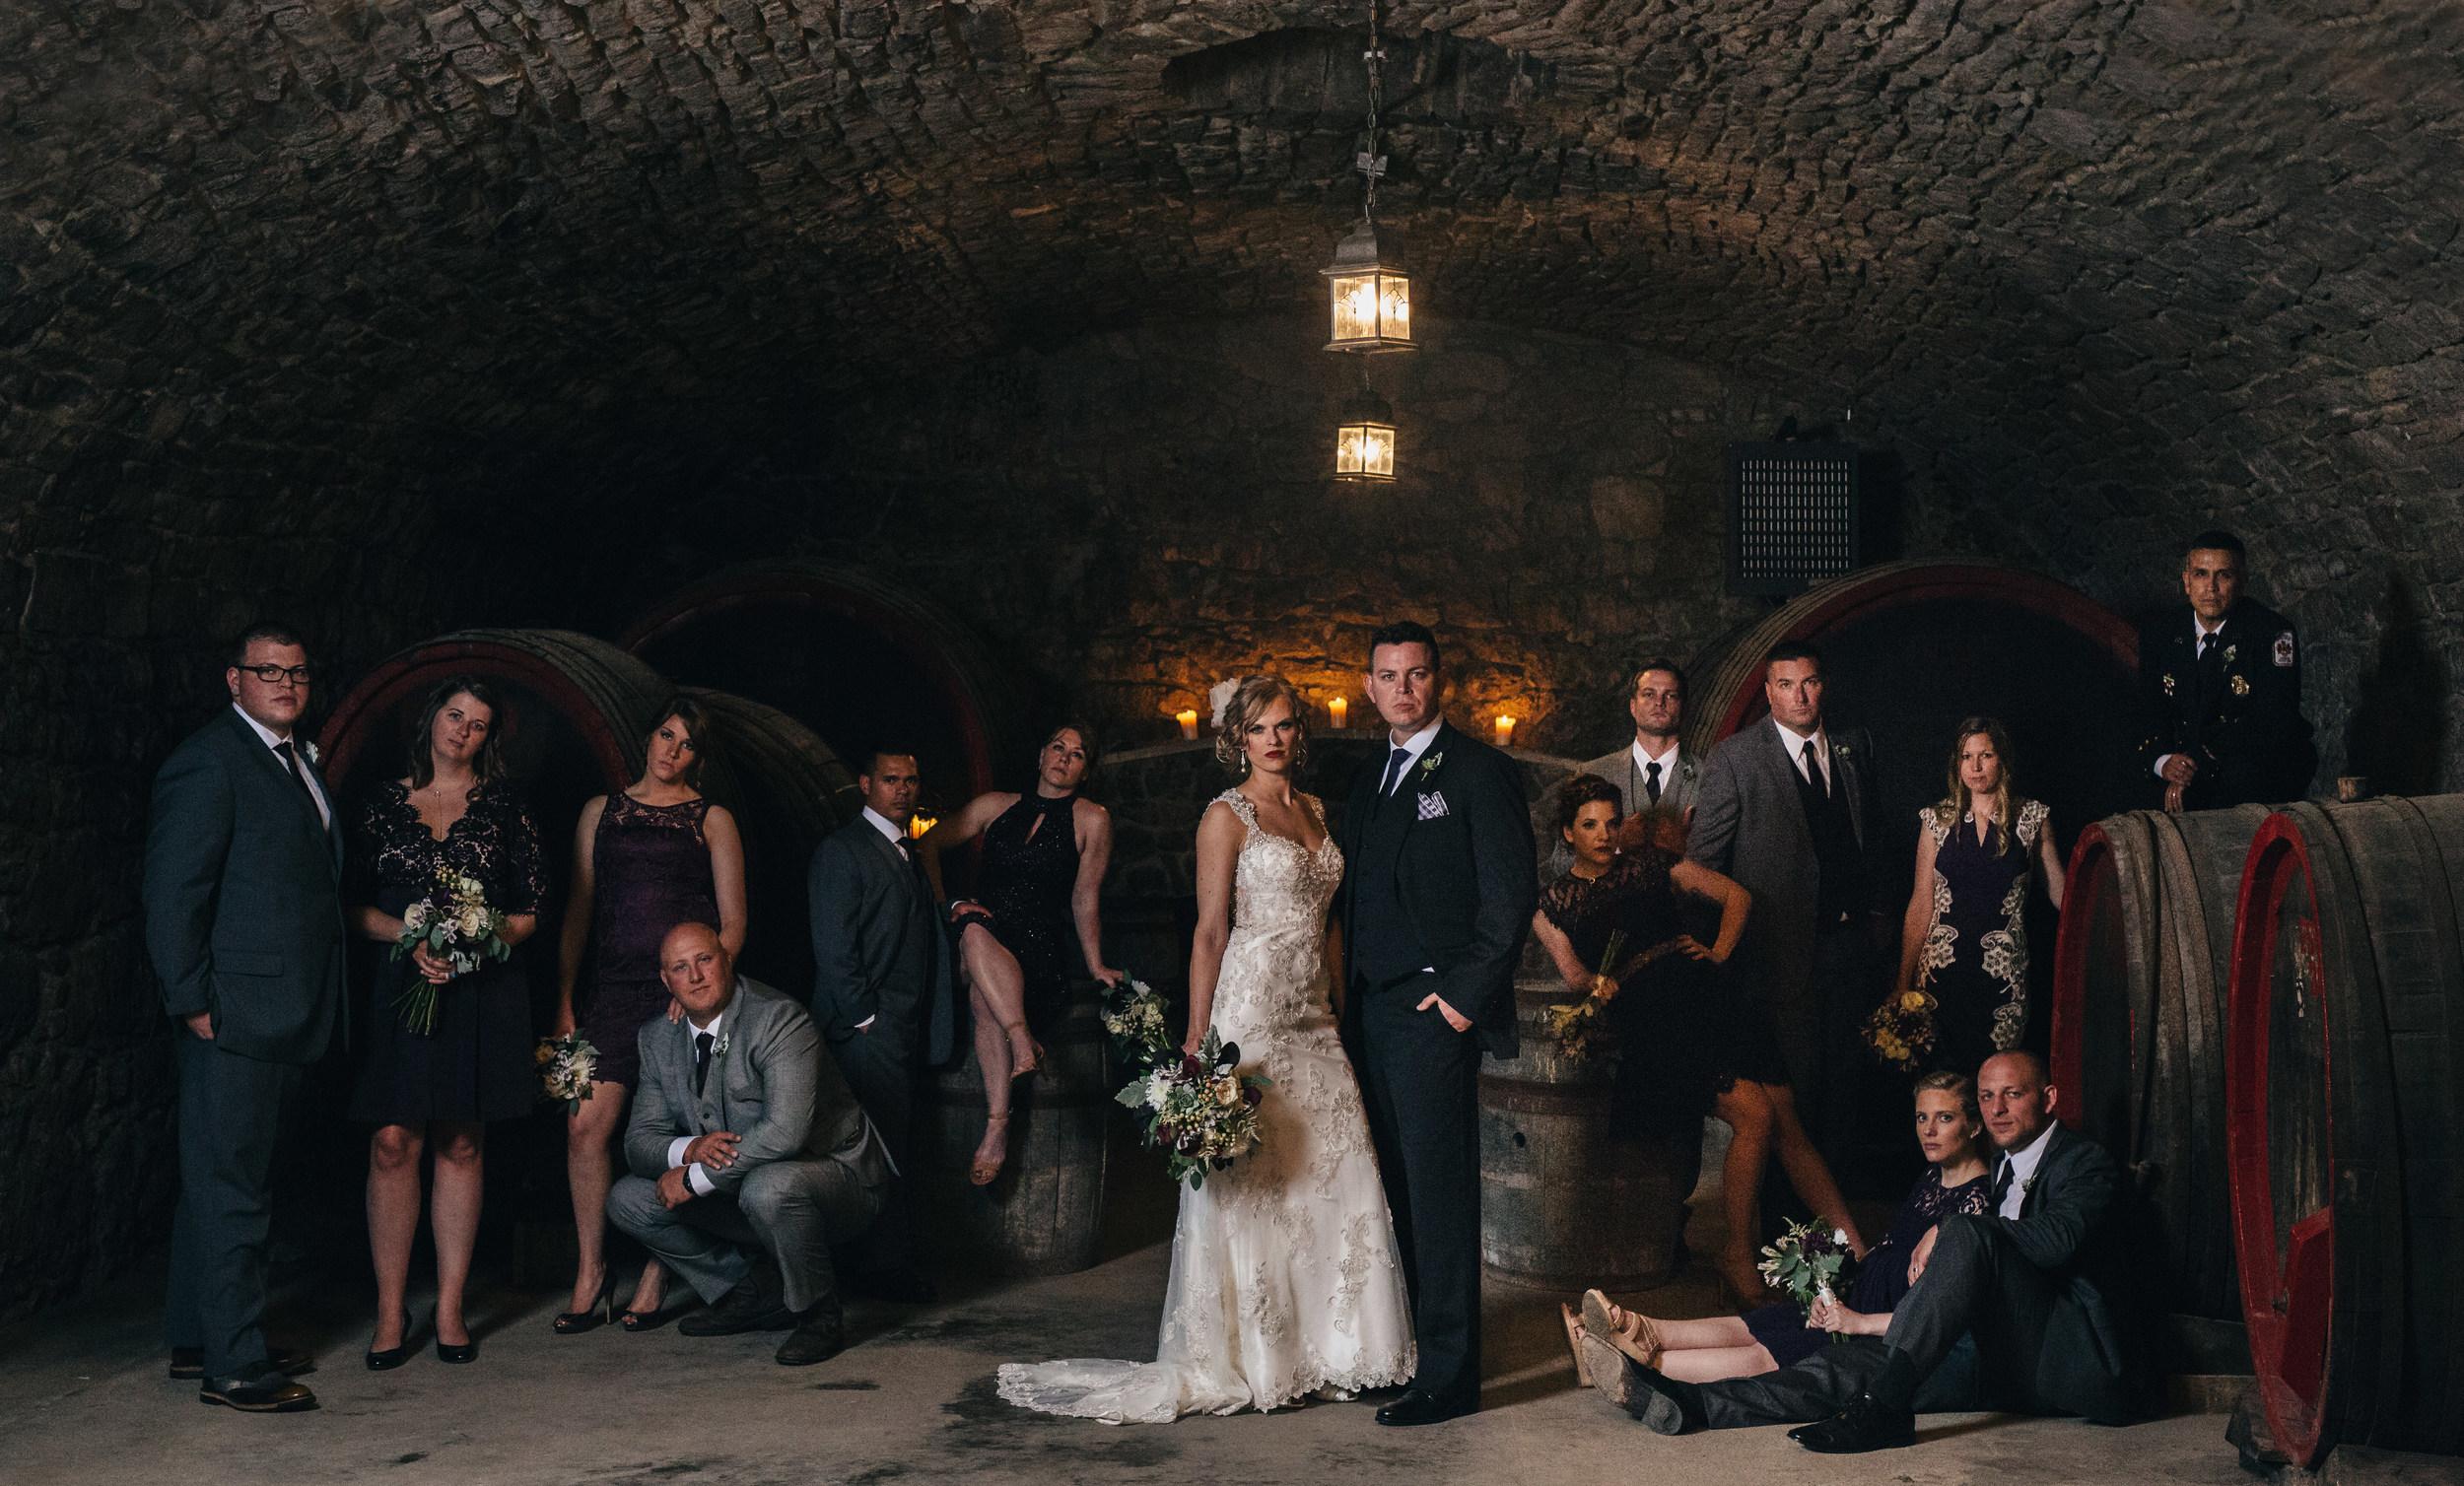 Annie Leibovitz style bridal party wedding photography.